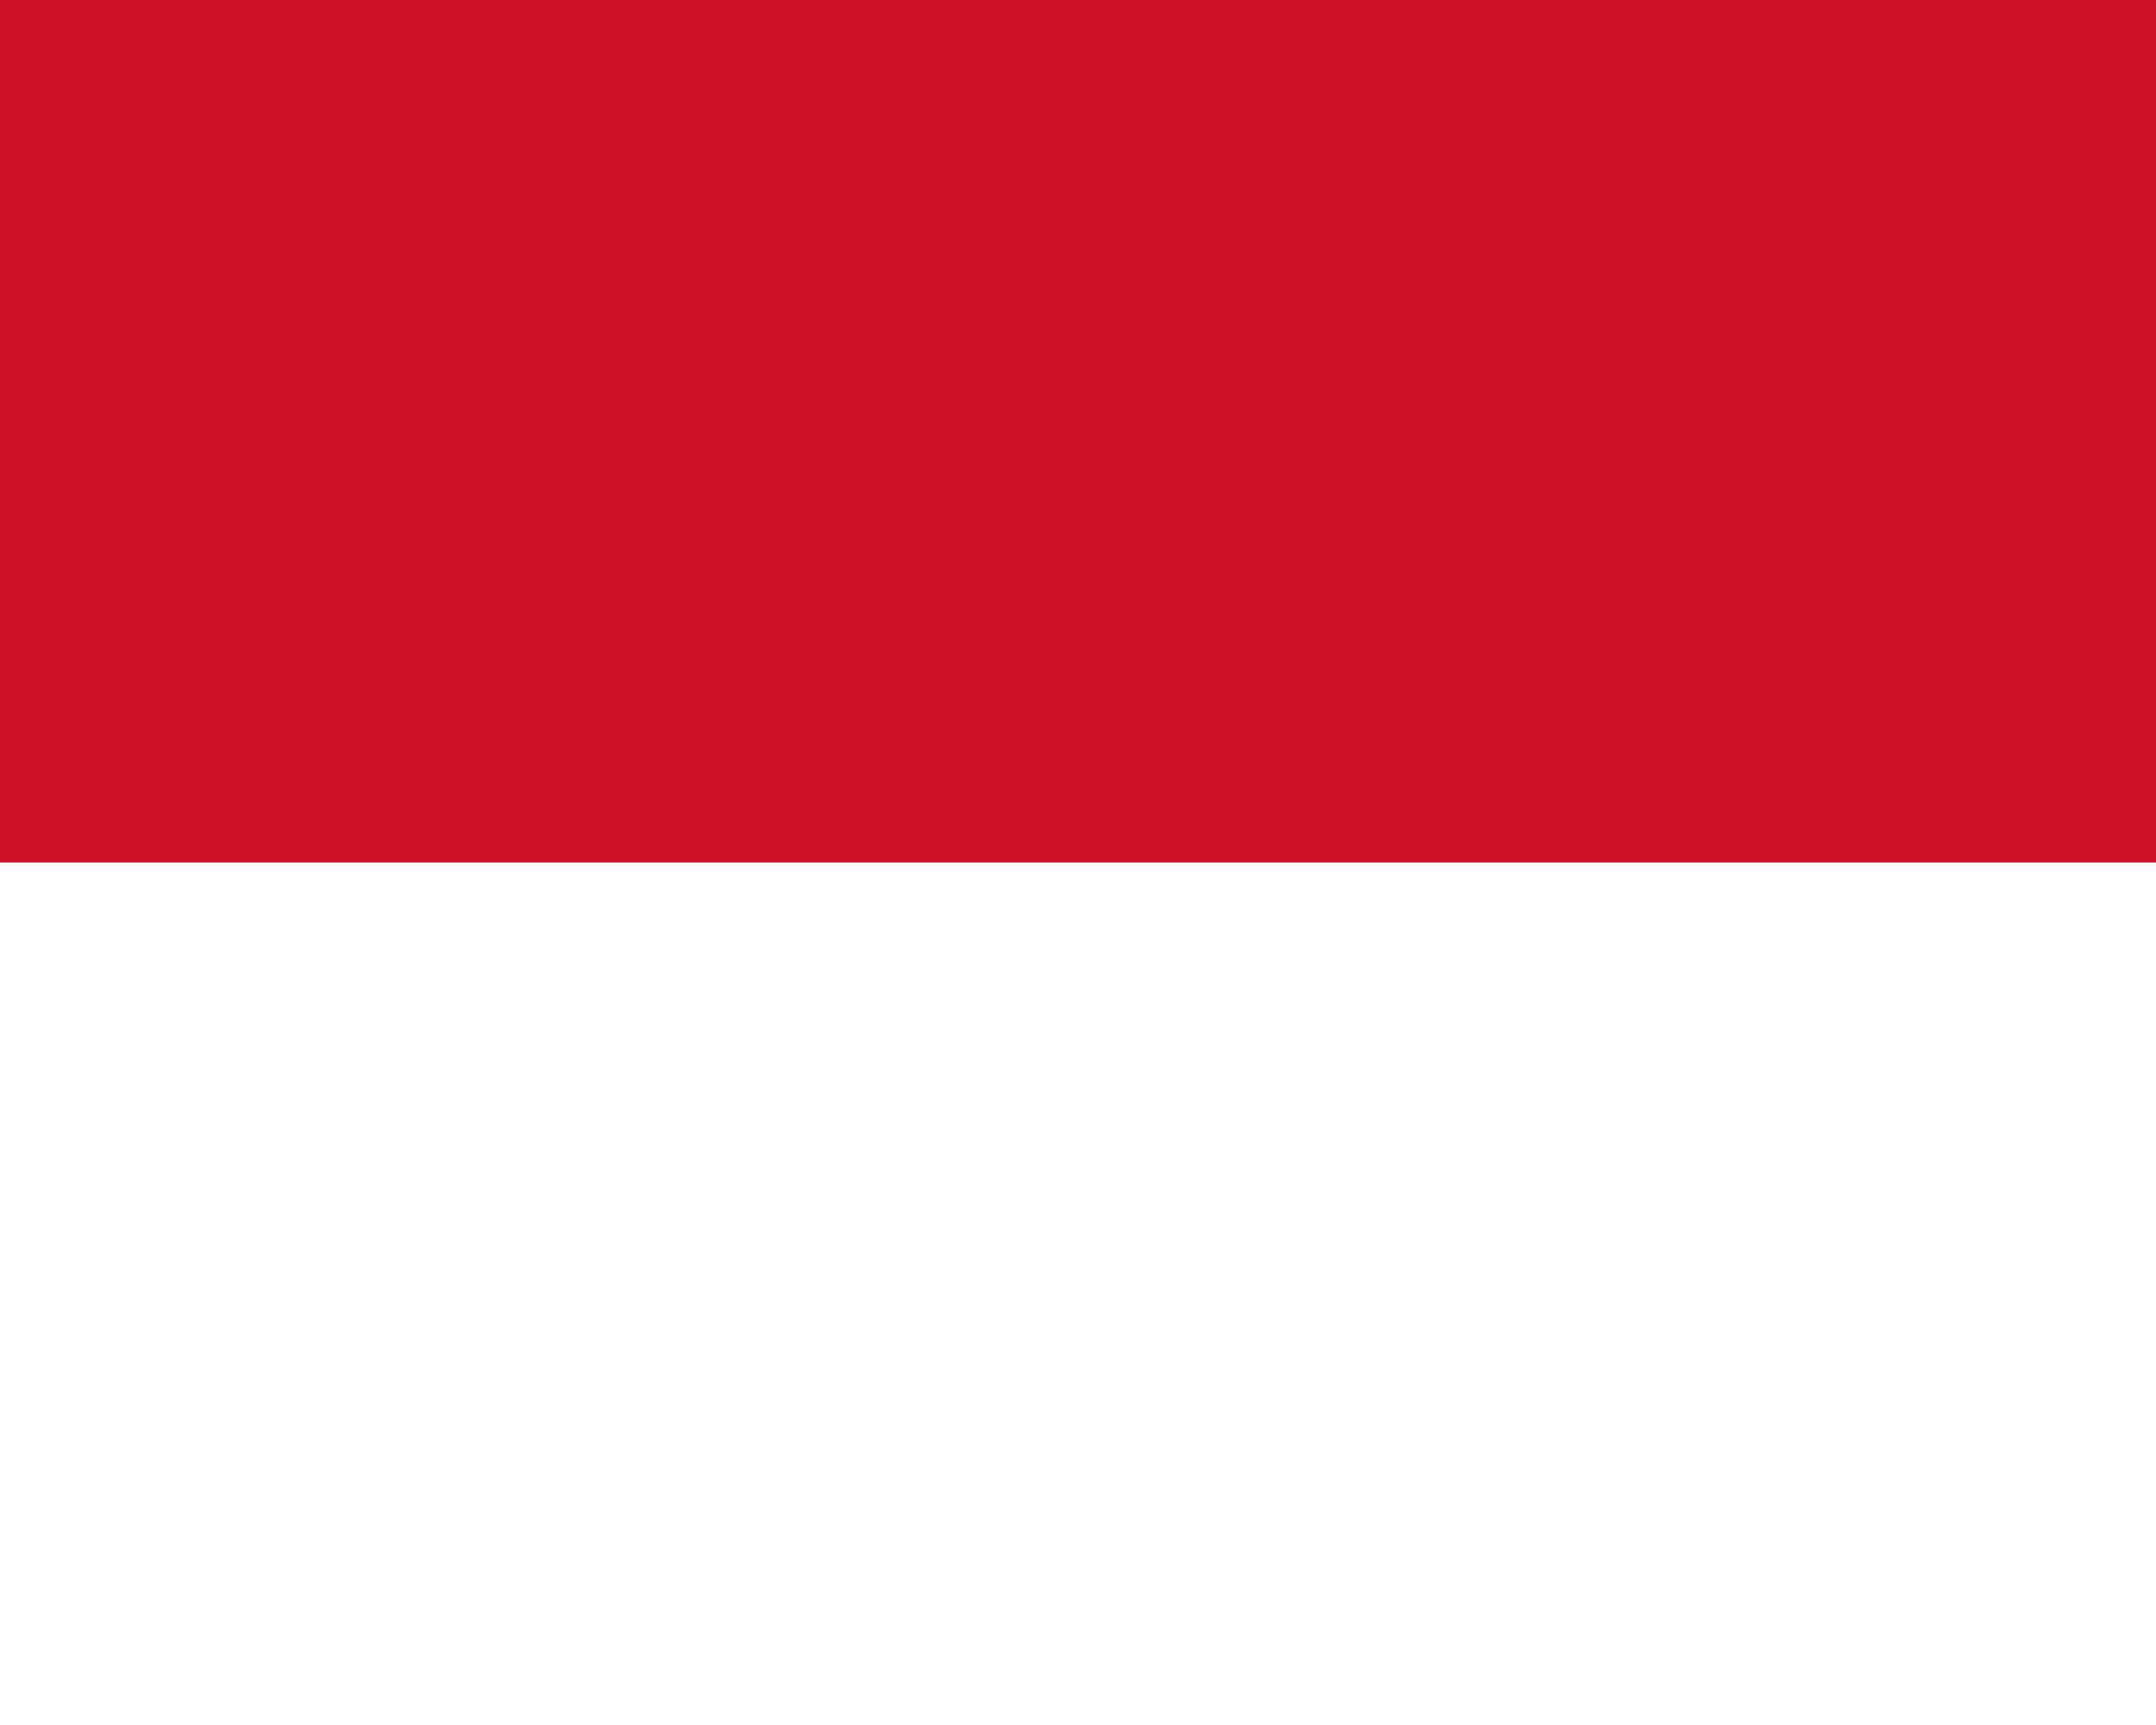 Monaco Flag Colours